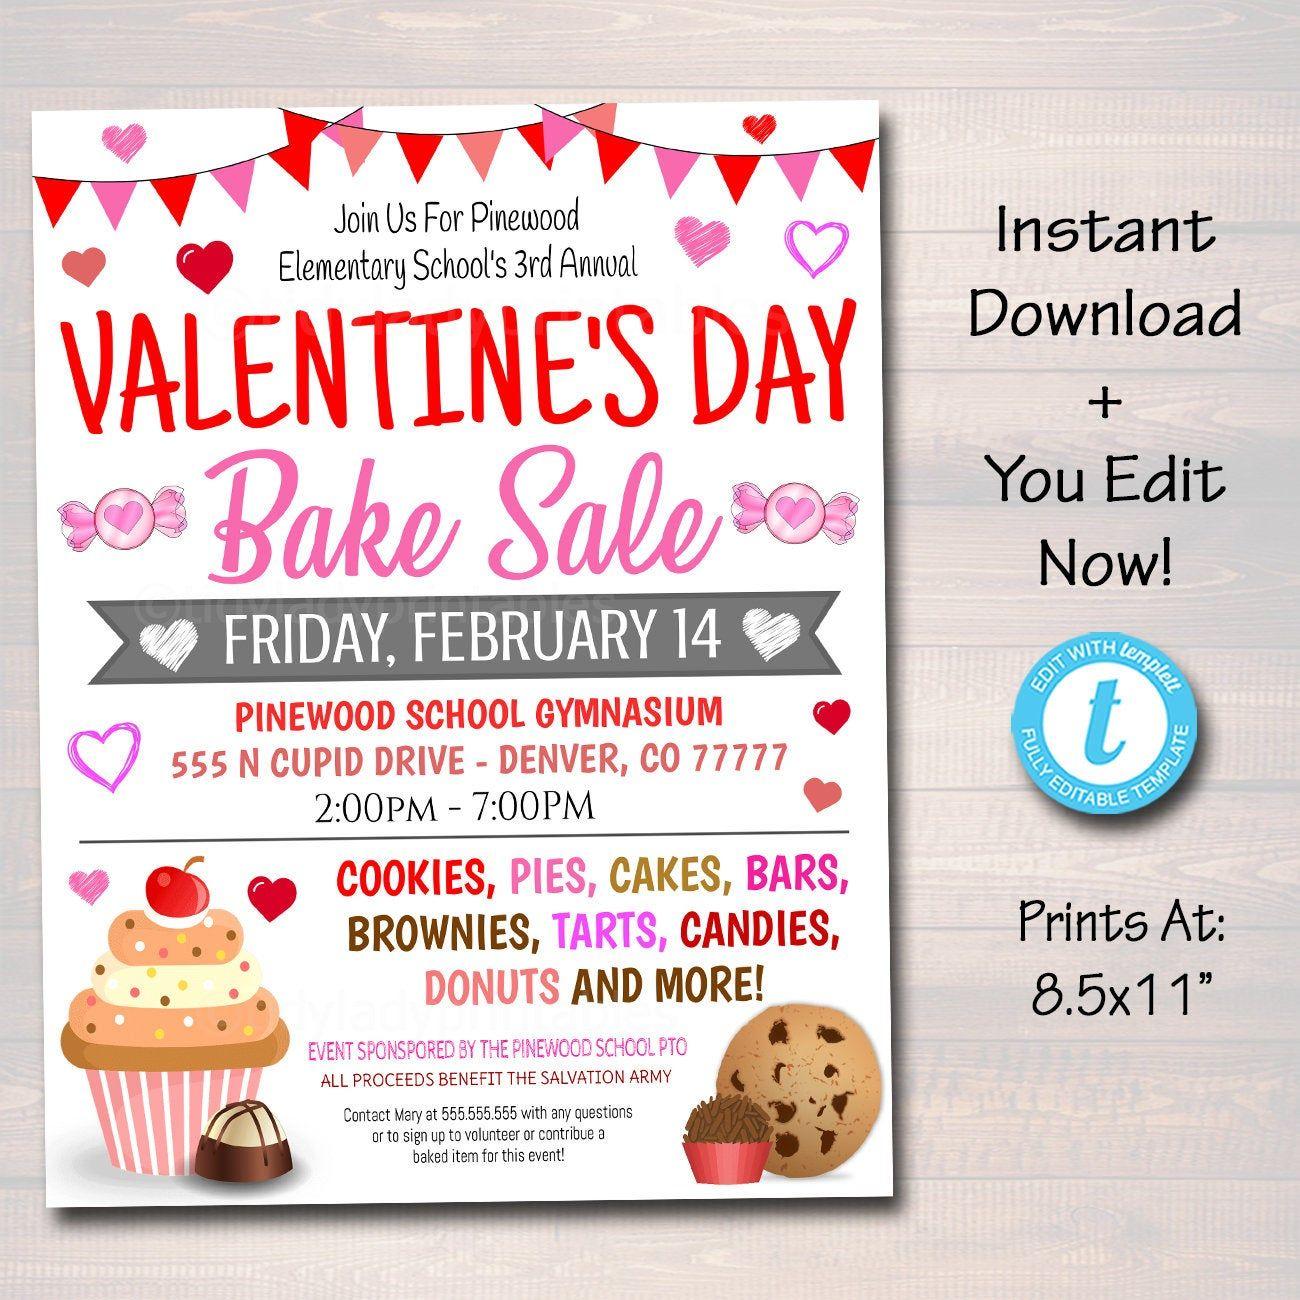 Valentine S Day Bake Sale Flyer Printable Pta Pto School Etsy Bake Sale Flyer Valentines Bakery Fundraiser Valentines